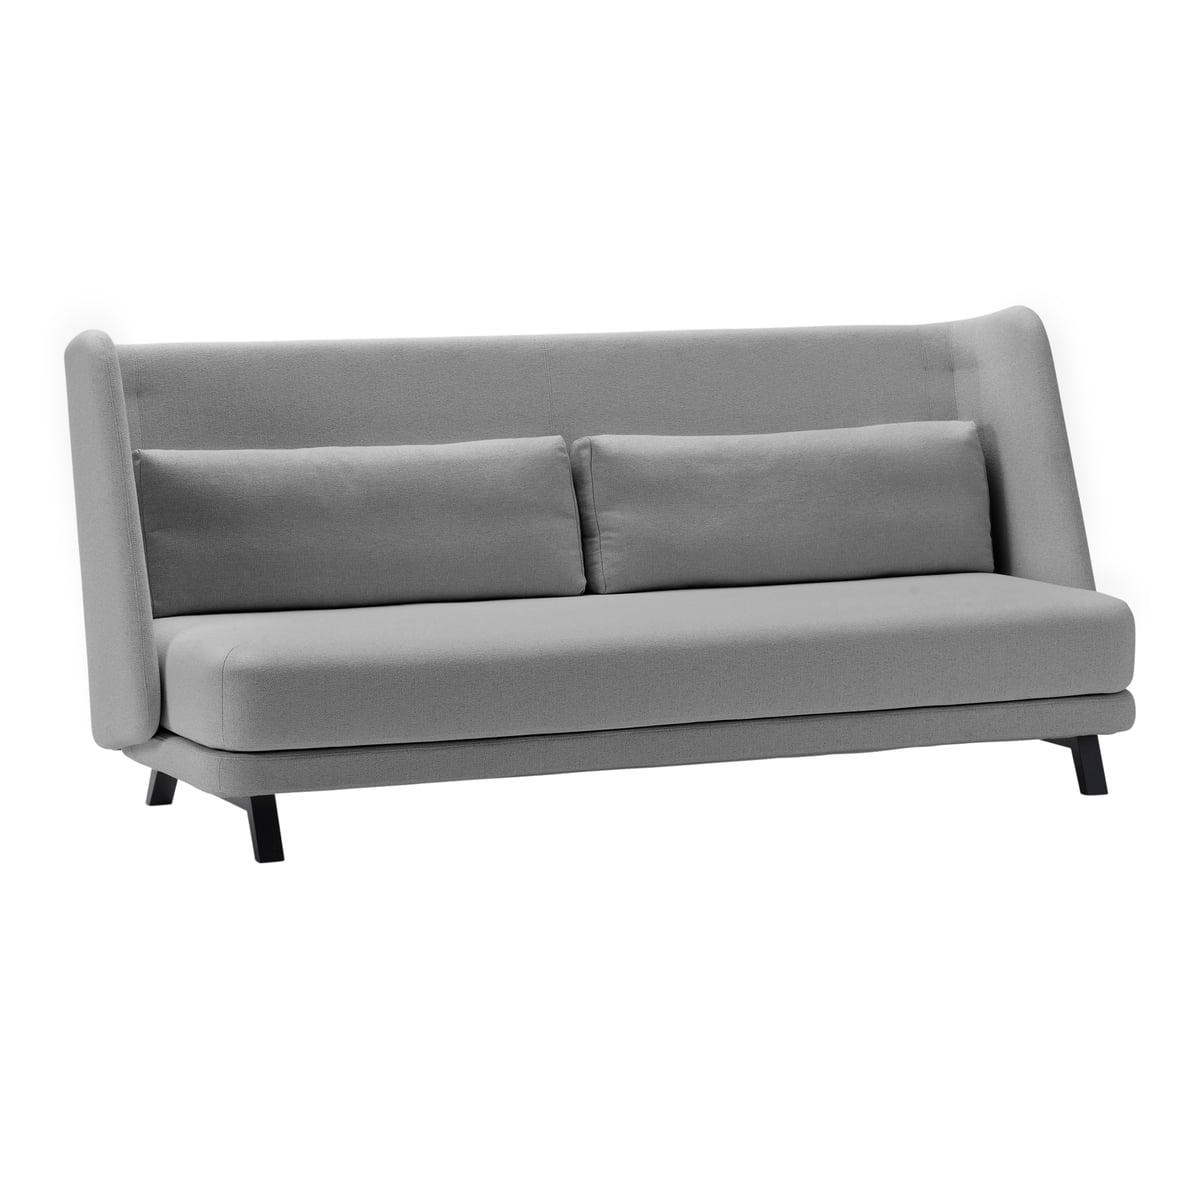 Outstanding Softline Jason Sofa Bed Ash Black Vision Light Grey 445 Unemploymentrelief Wooden Chair Designs For Living Room Unemploymentrelieforg